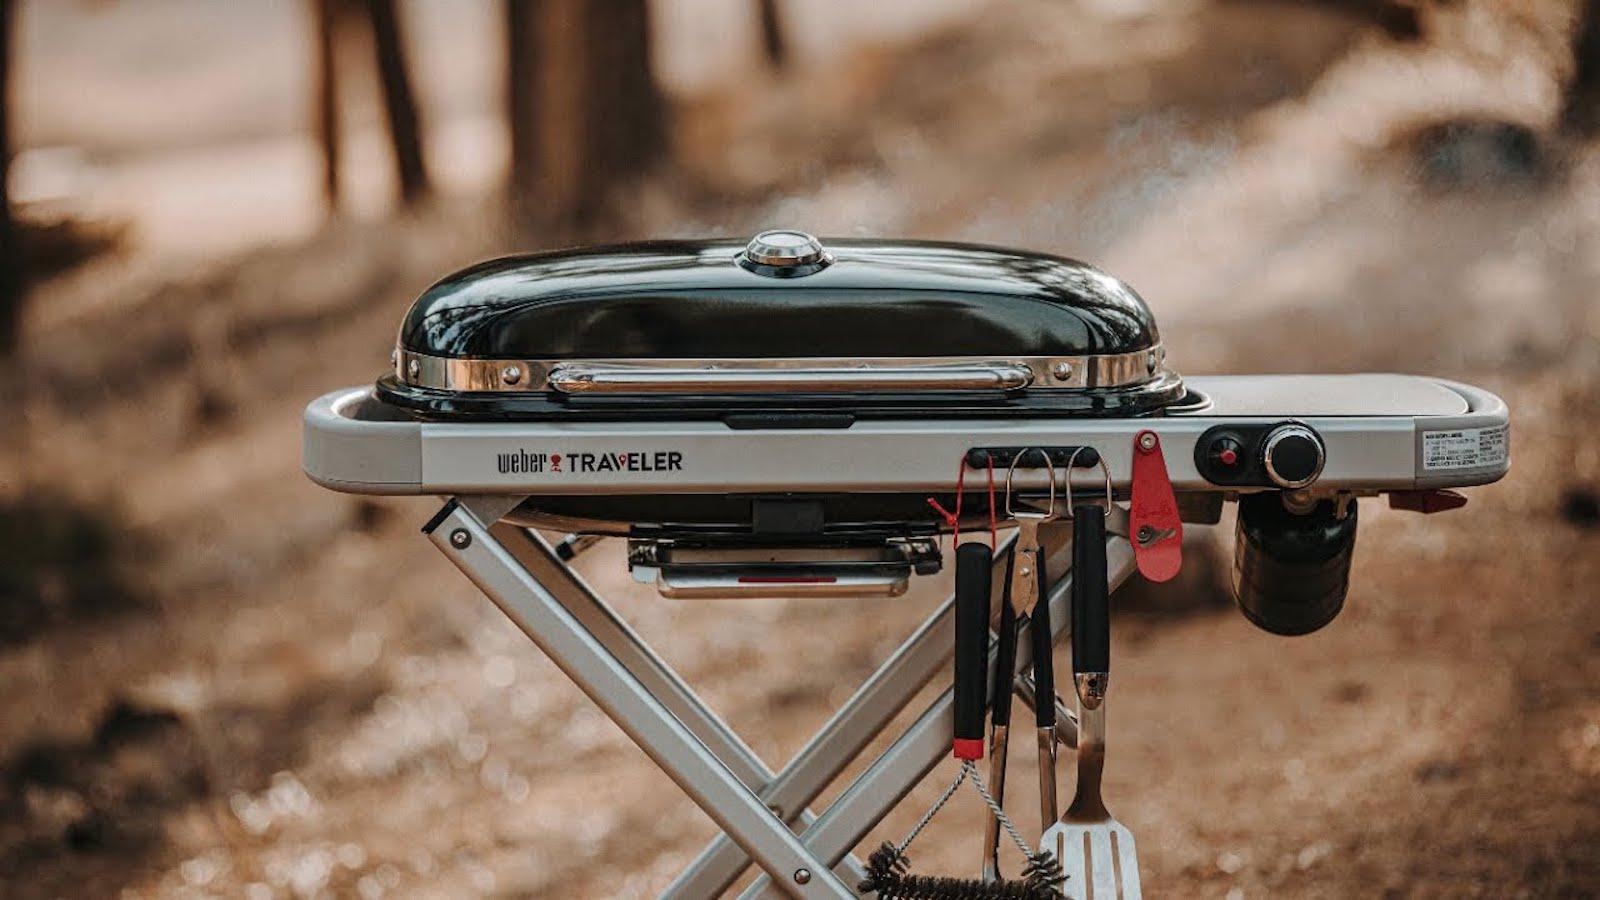 Weber-Traveler-Portable-Gas-Grill-01.jpg